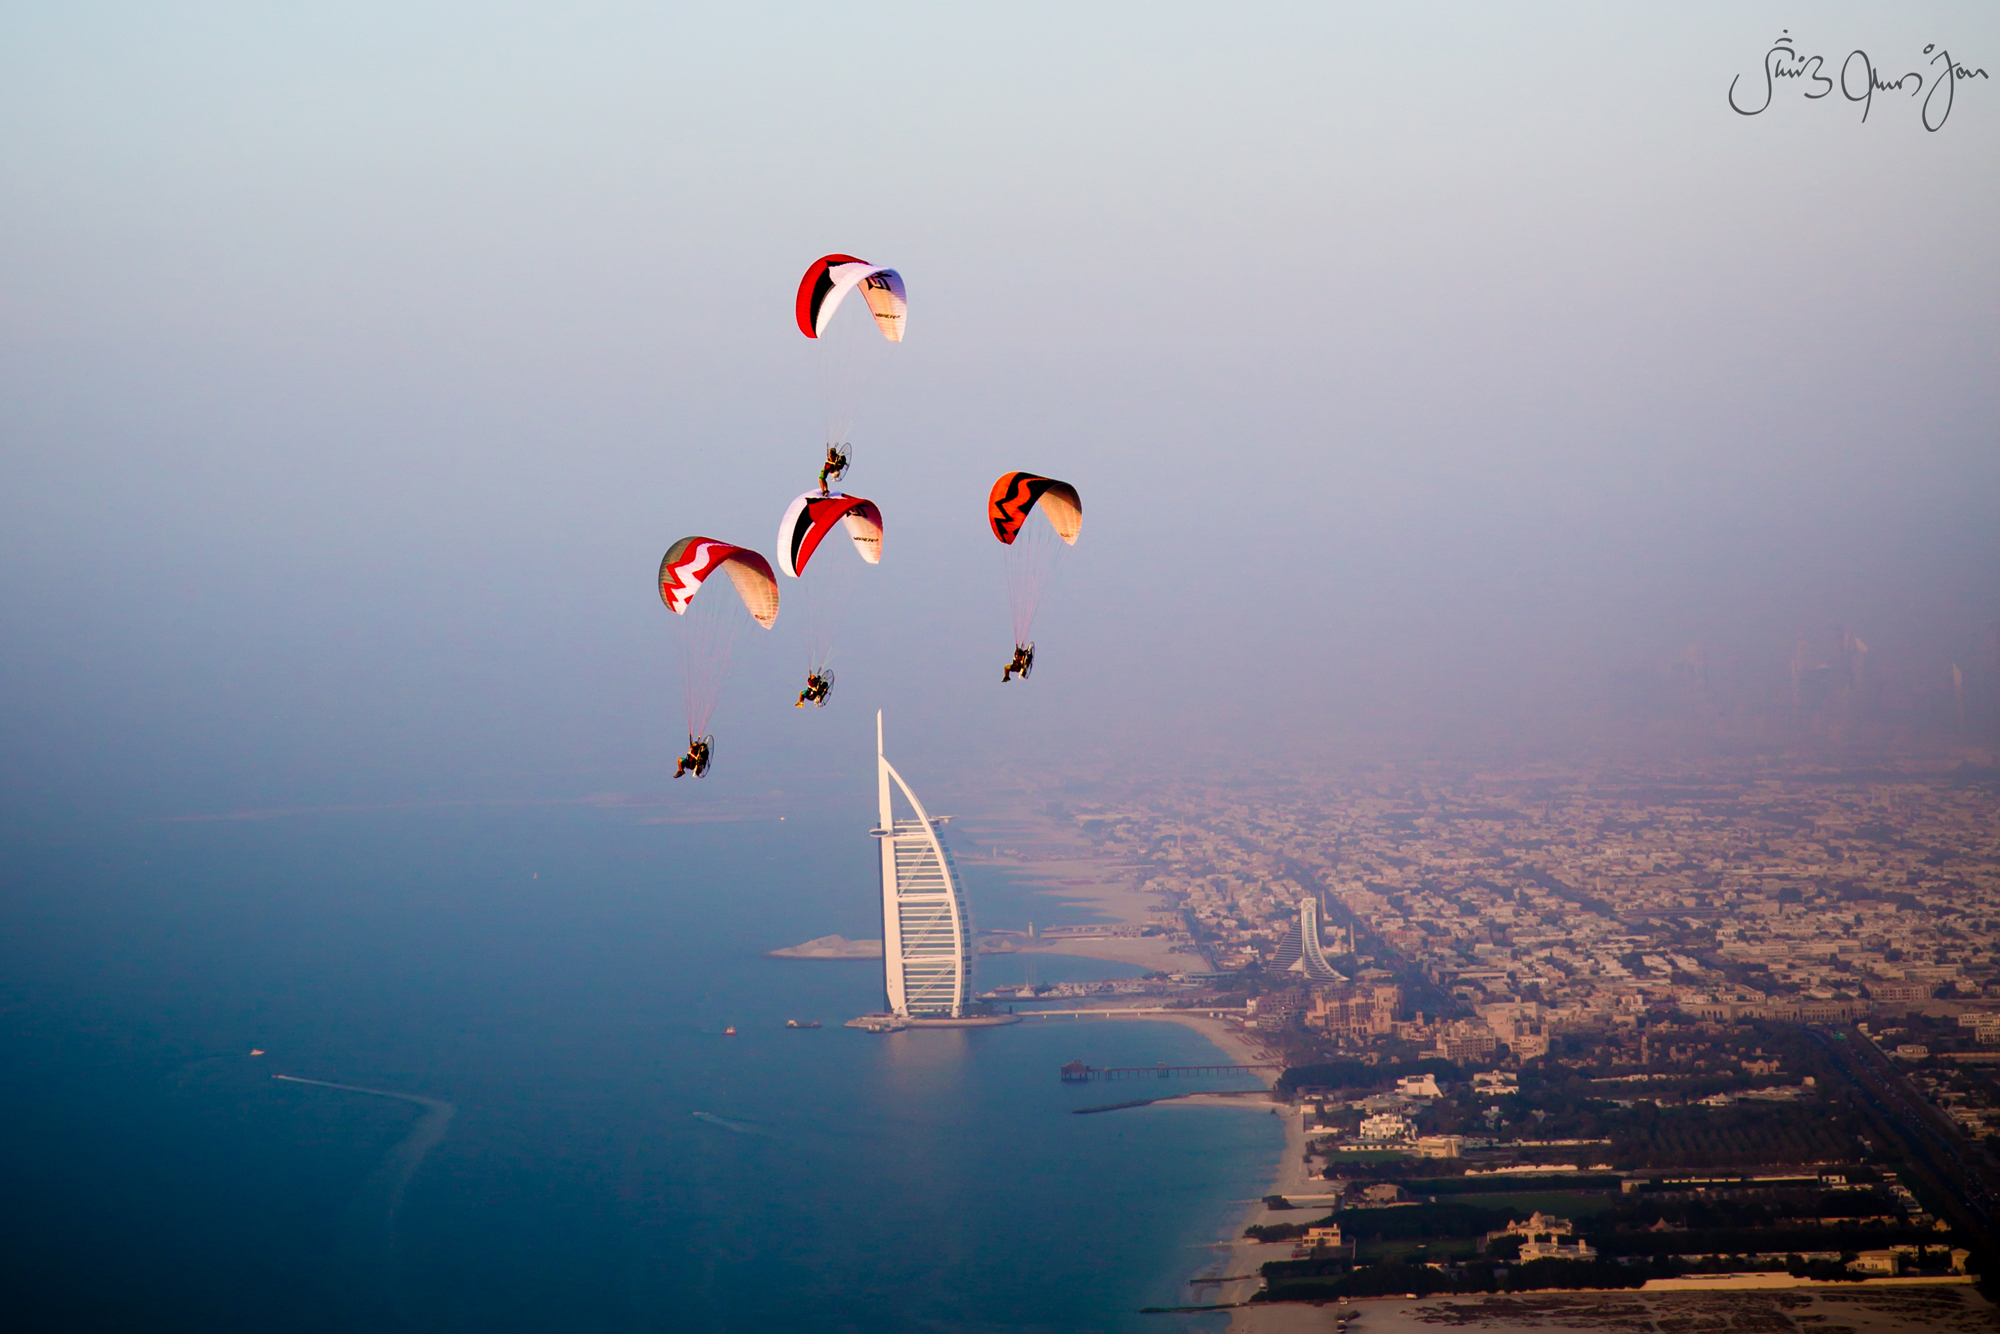 WTB-6464 Skyhub paramotors Palm Dubai marina Francois ragolski Martin schricke